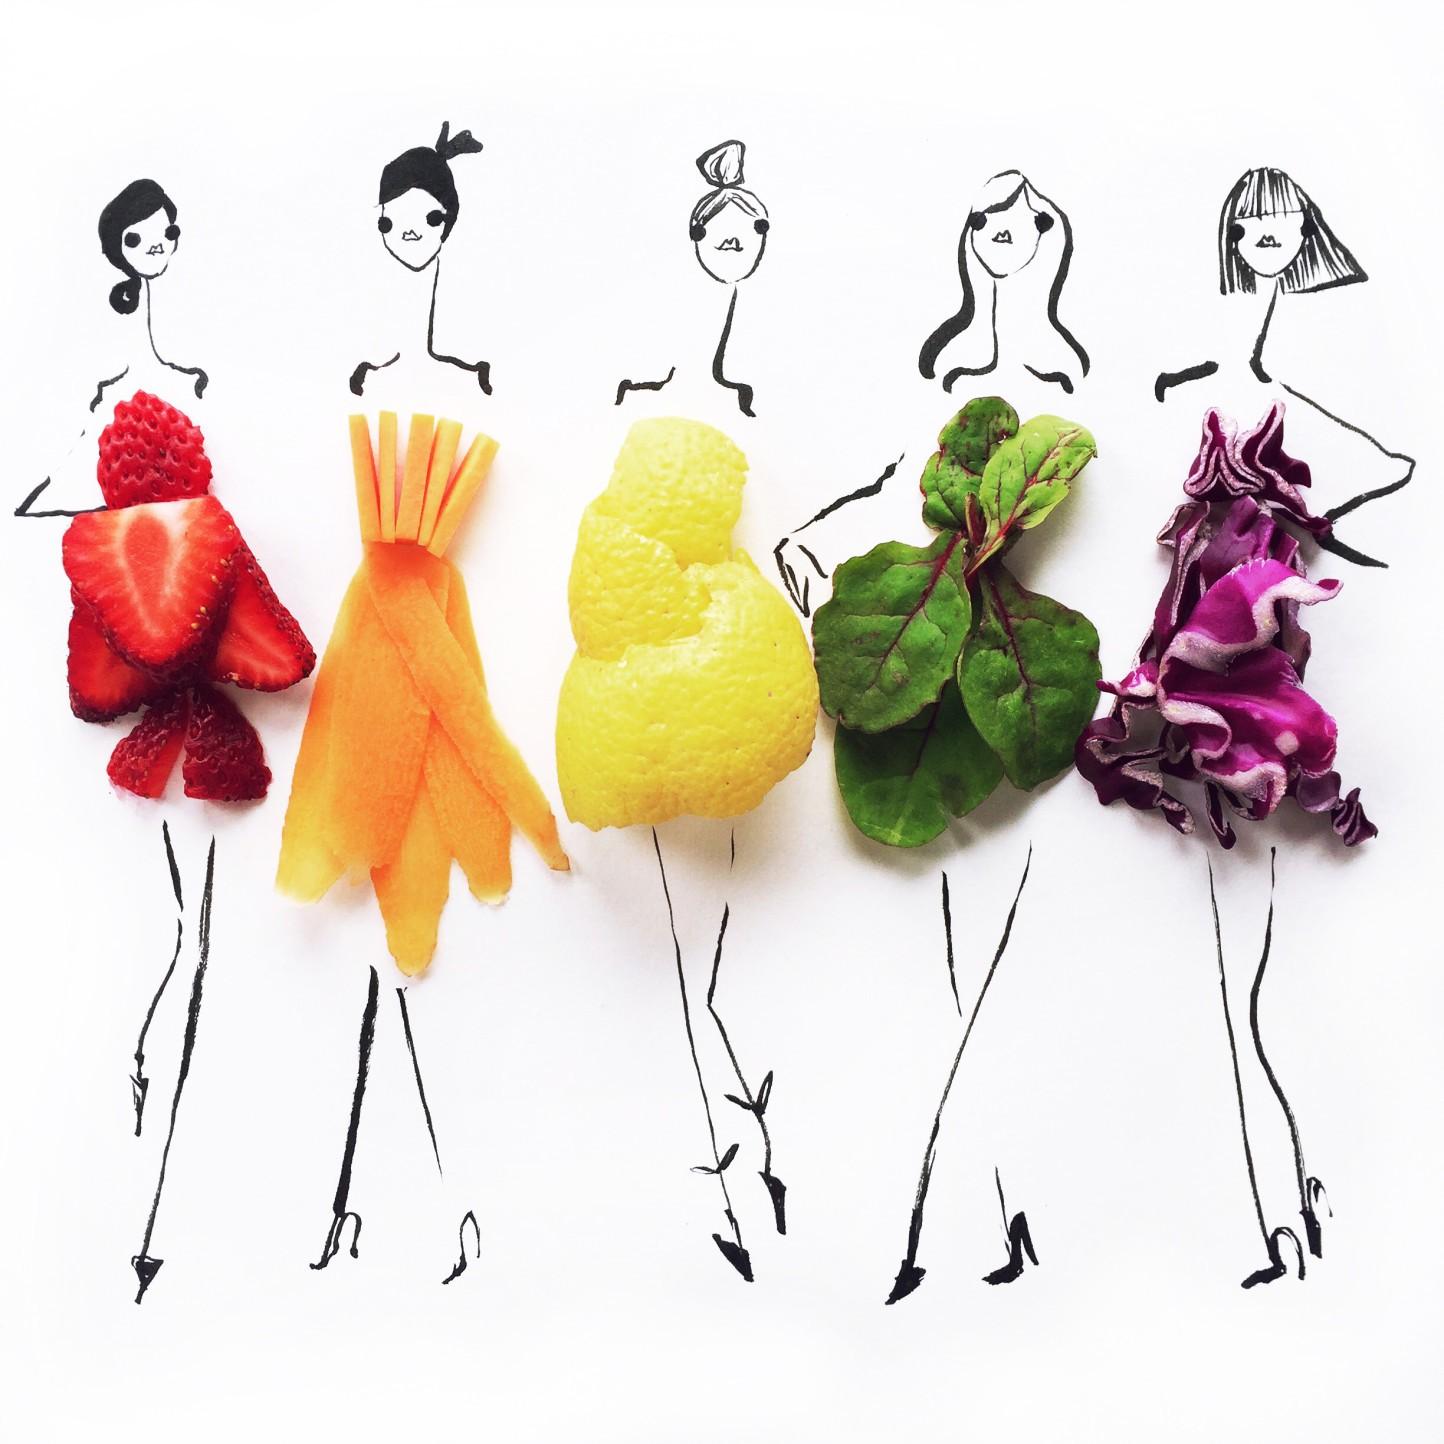 Slow nutrition (Foto: Reprodução/Instagram Gretchen Roehrs)